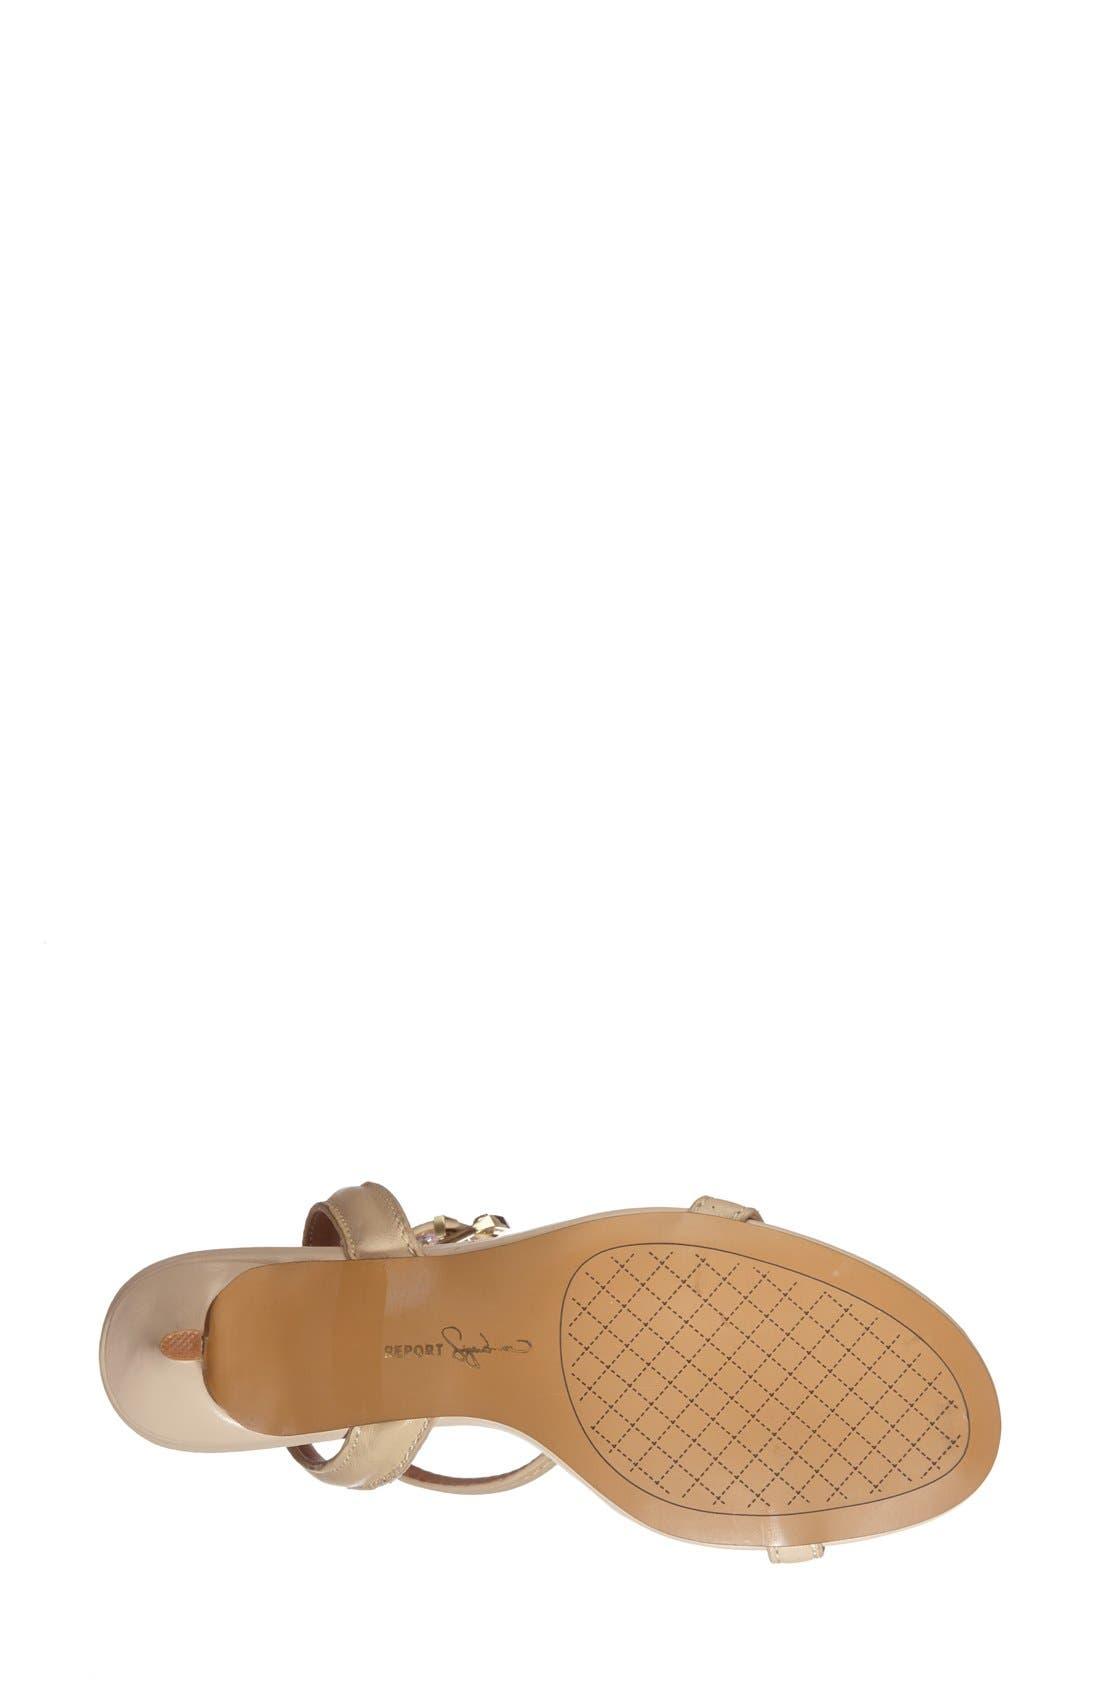 Alternate Image 4  - REPORT 'Signature Neely' Ankle Strap Sandal (Women)